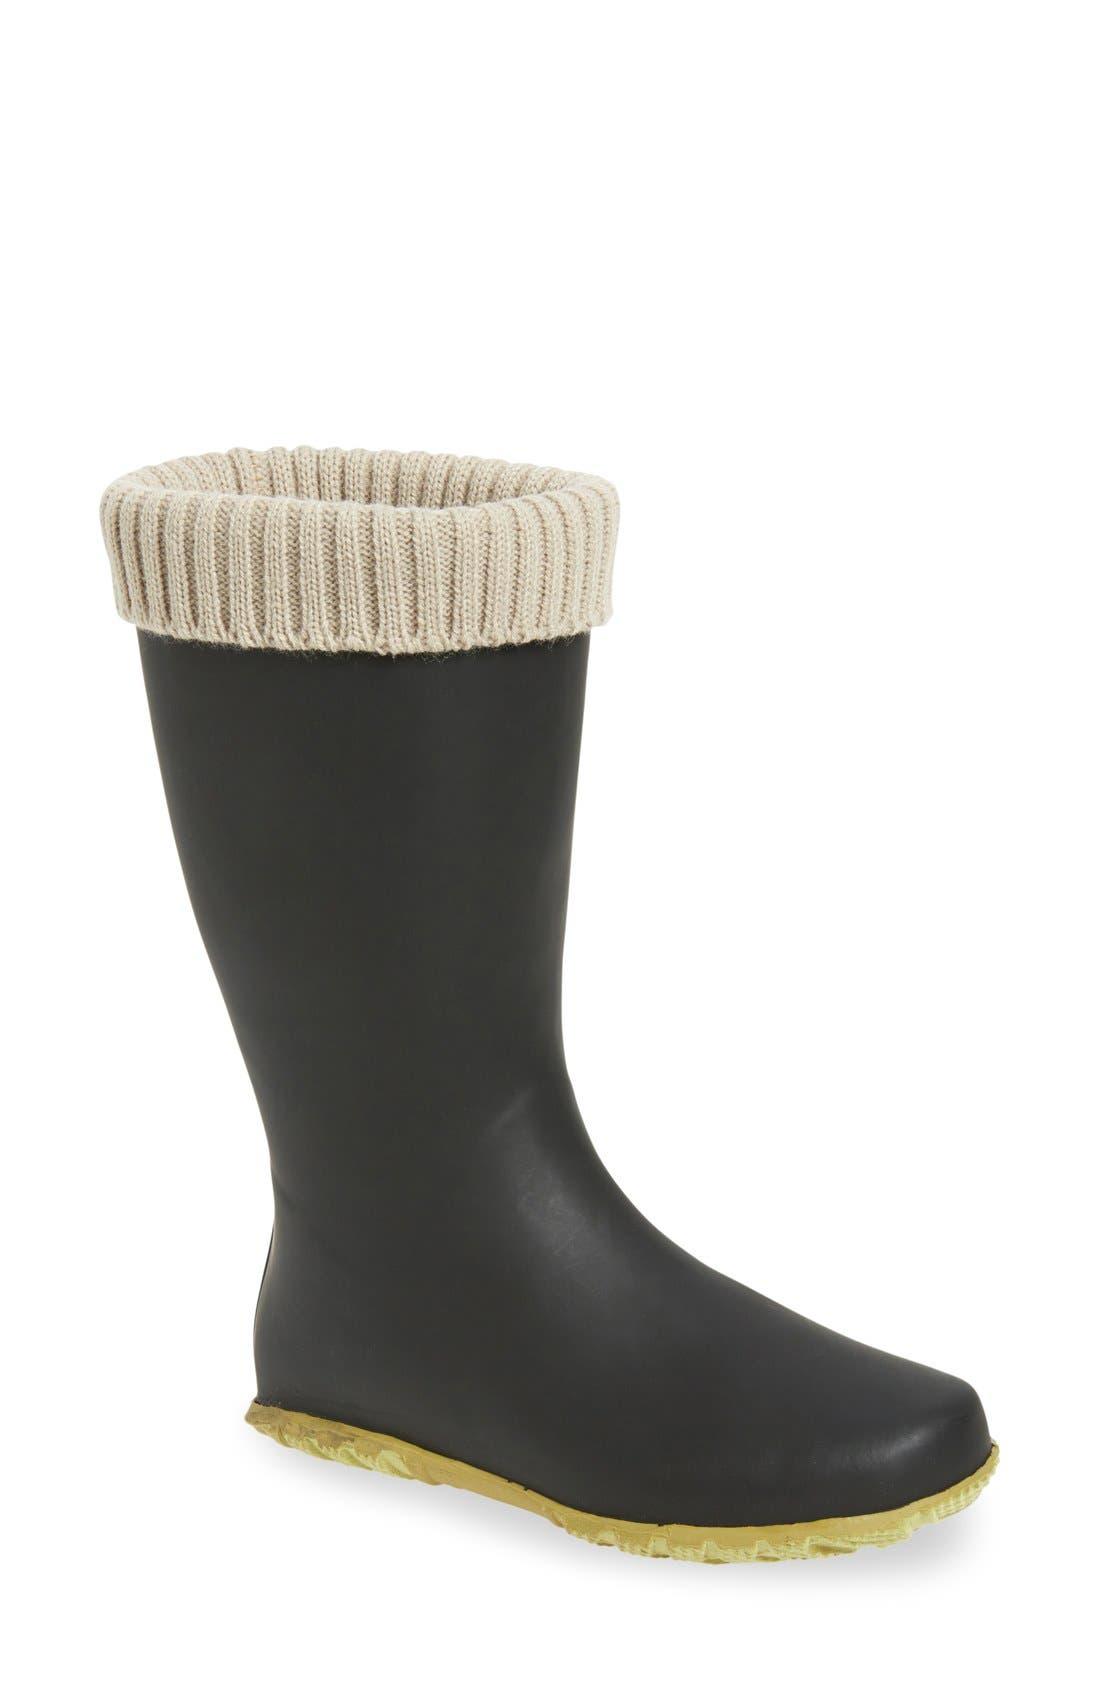 Weatherproof Rain Boot,                             Main thumbnail 1, color,                             Black